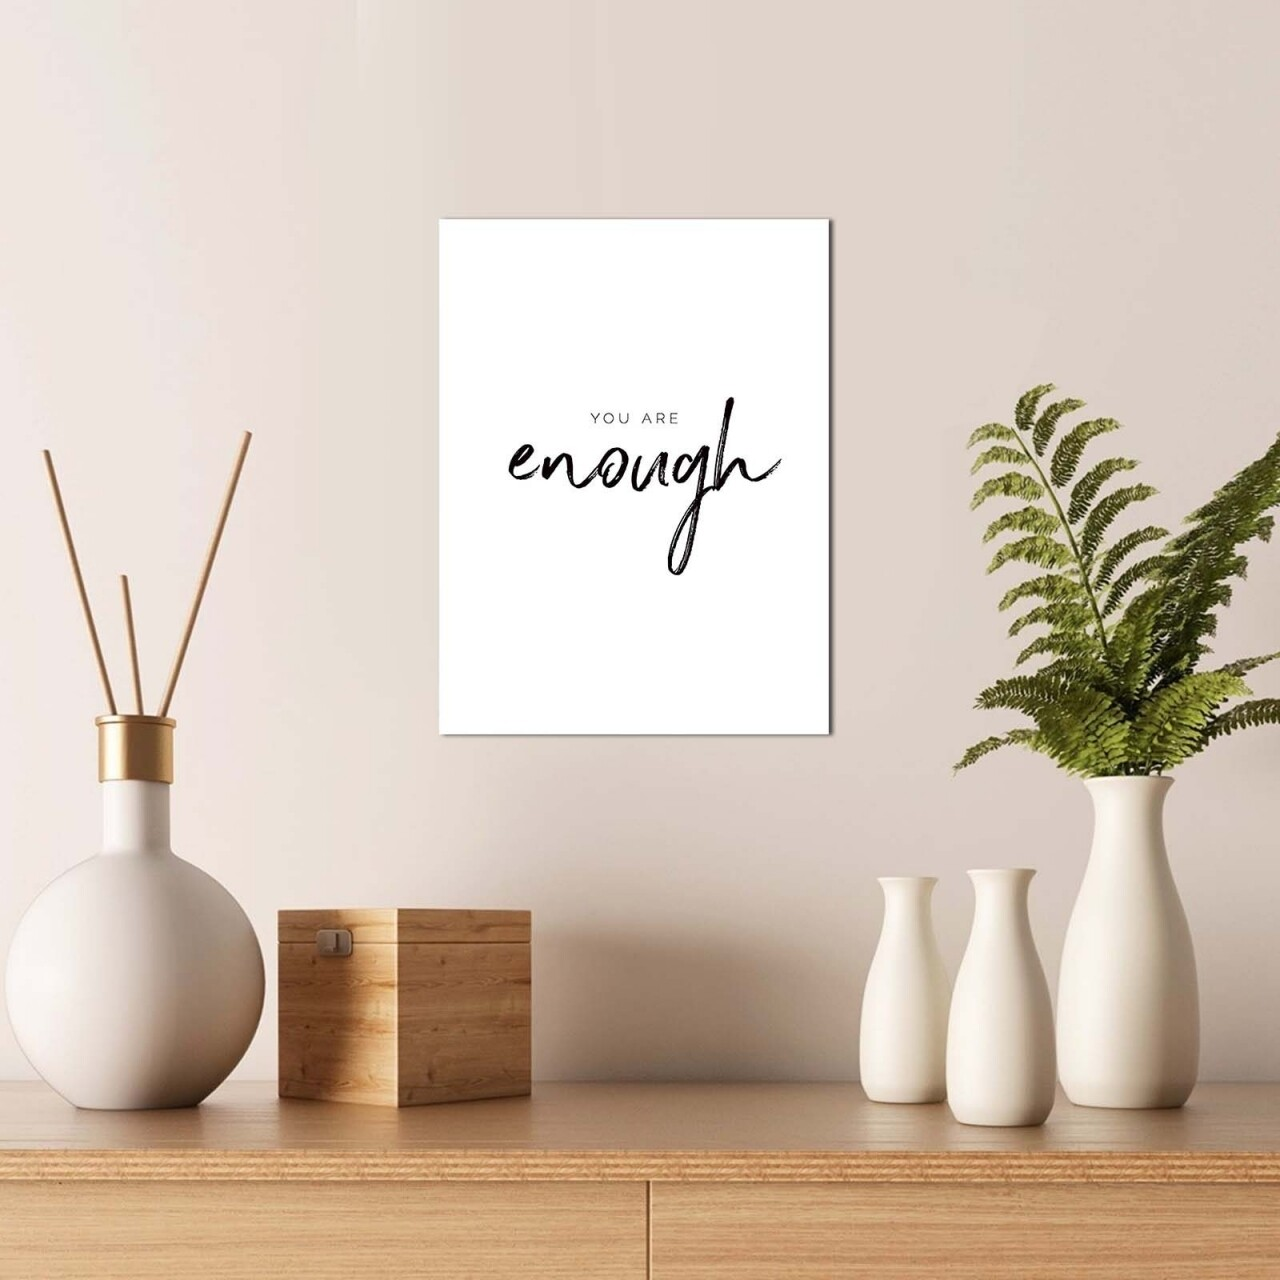 Tablou decorativ, Alpha Wall, You are Enough, 30x40 cm